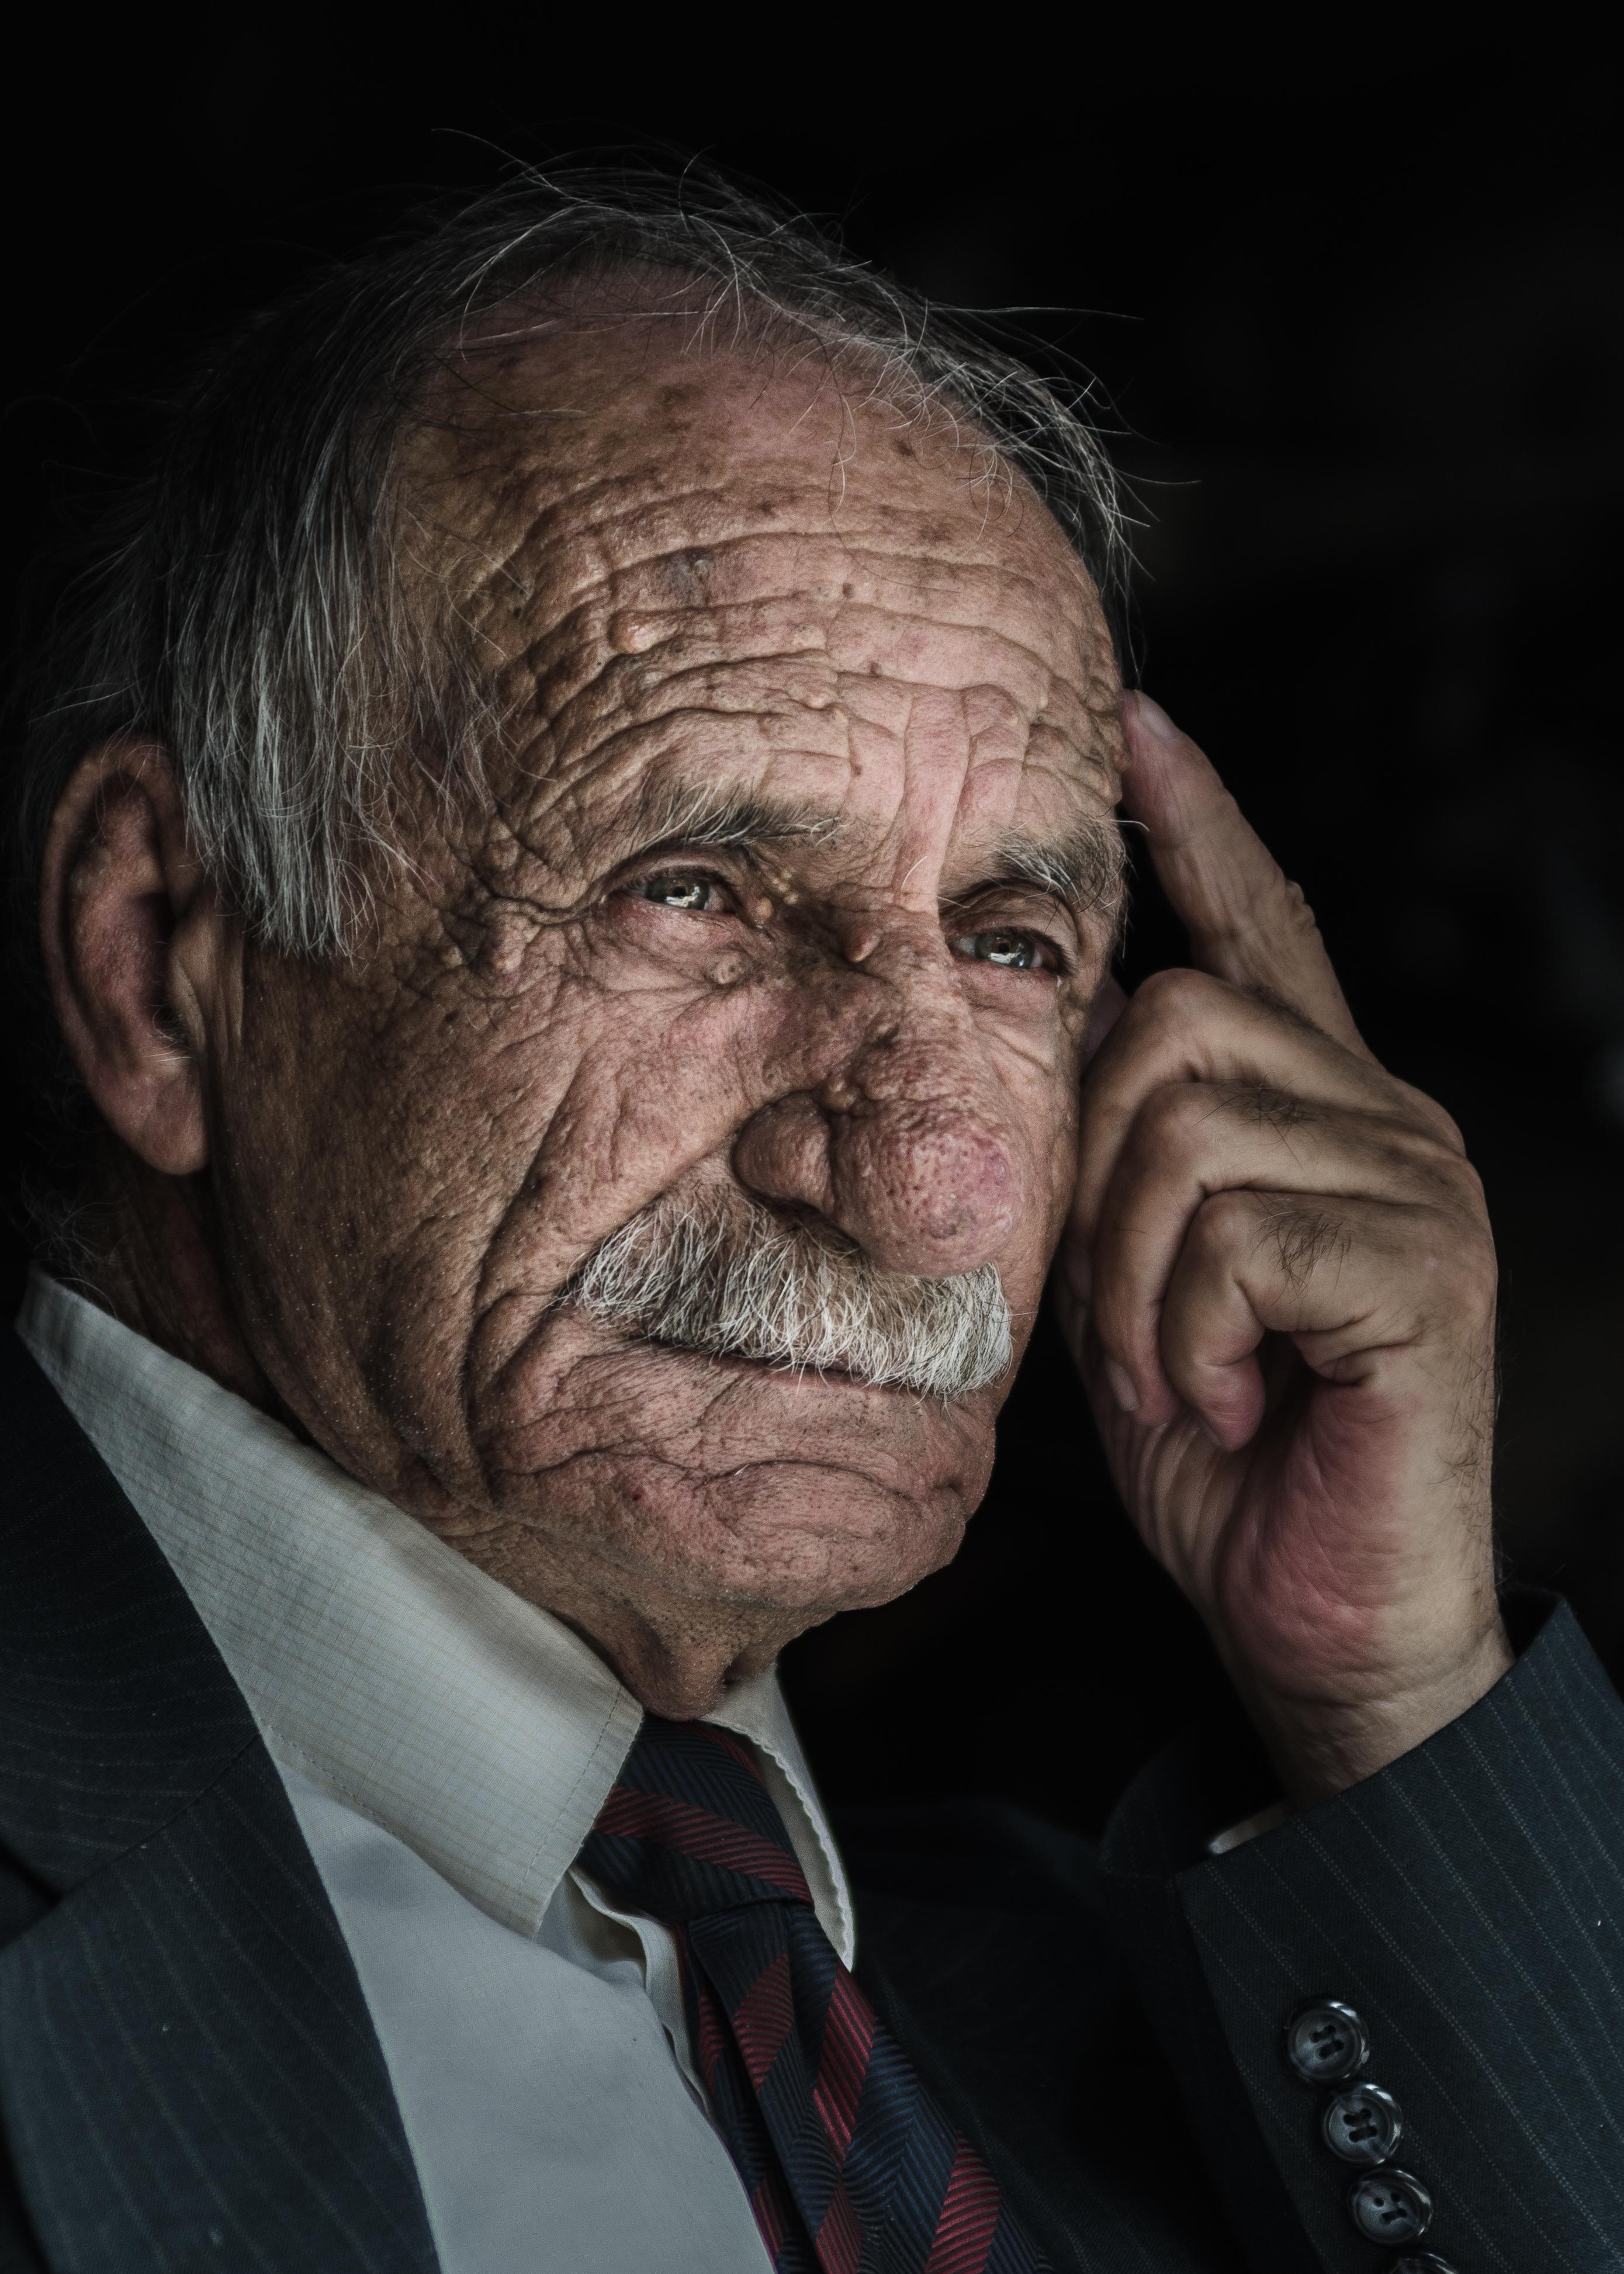 wrinkles portrait